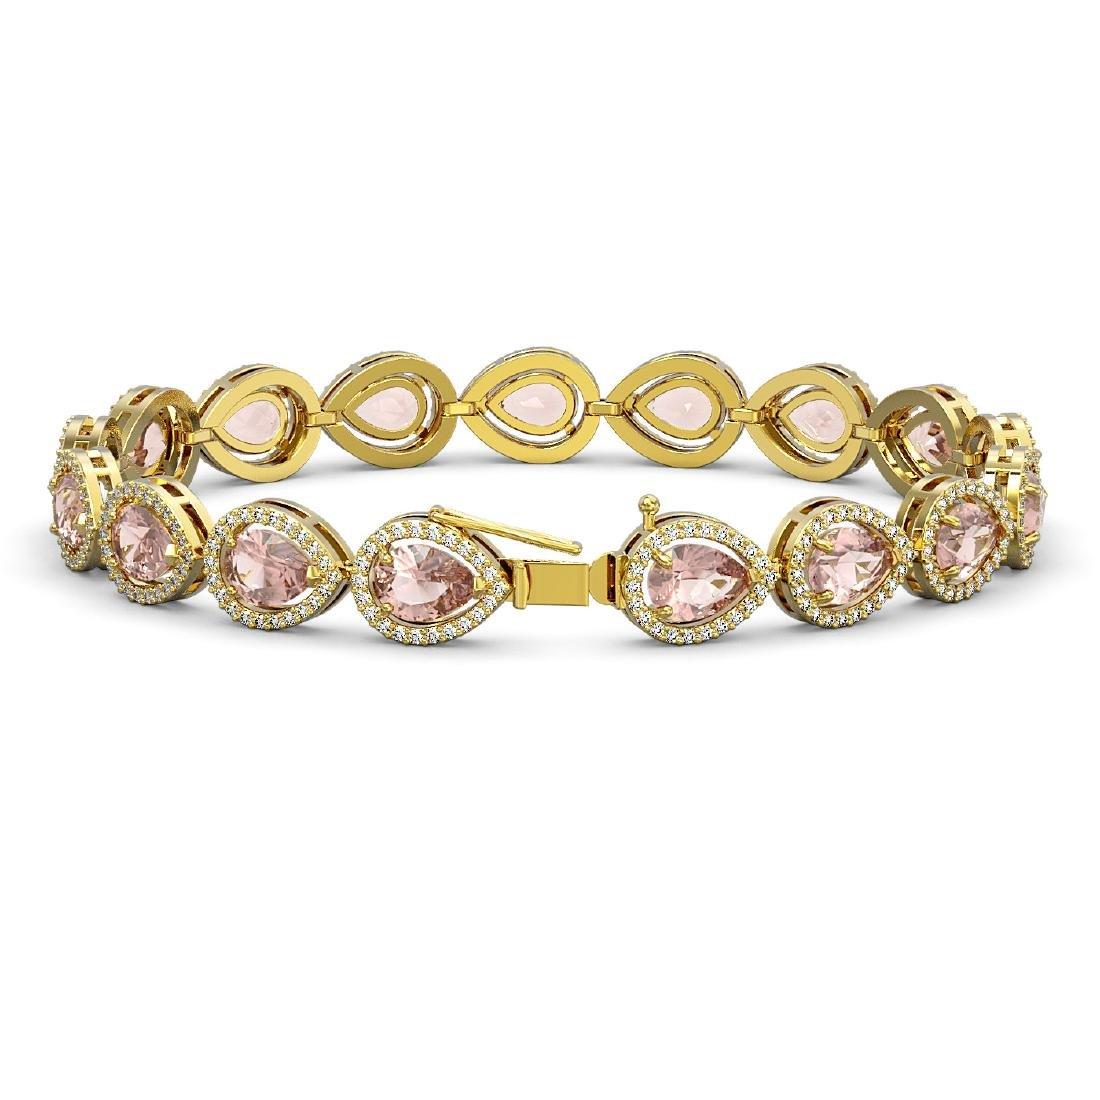 16.59 CTW Morganite & Diamond Halo Bracelet 10K Yellow - 2